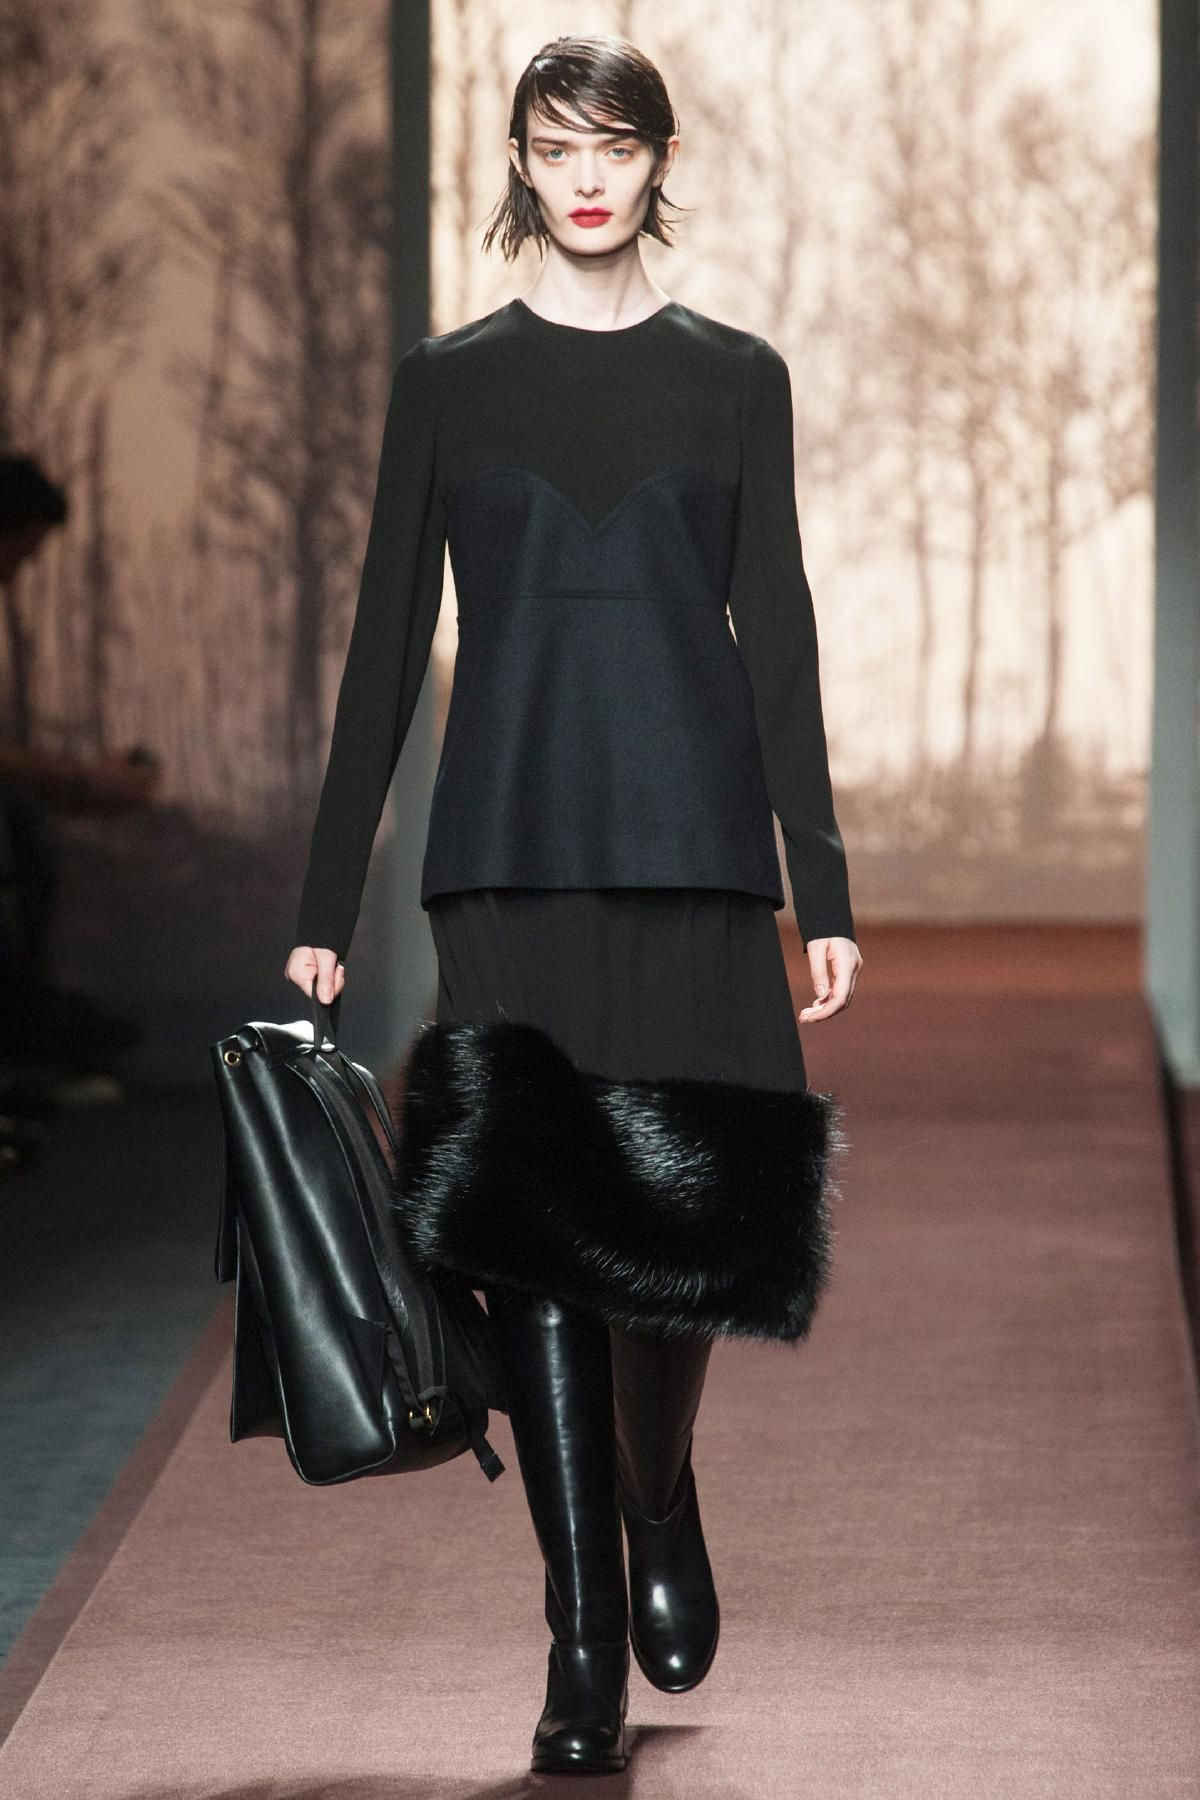 Marni Fall 2013 RTW Collection - Fashion on TheCut